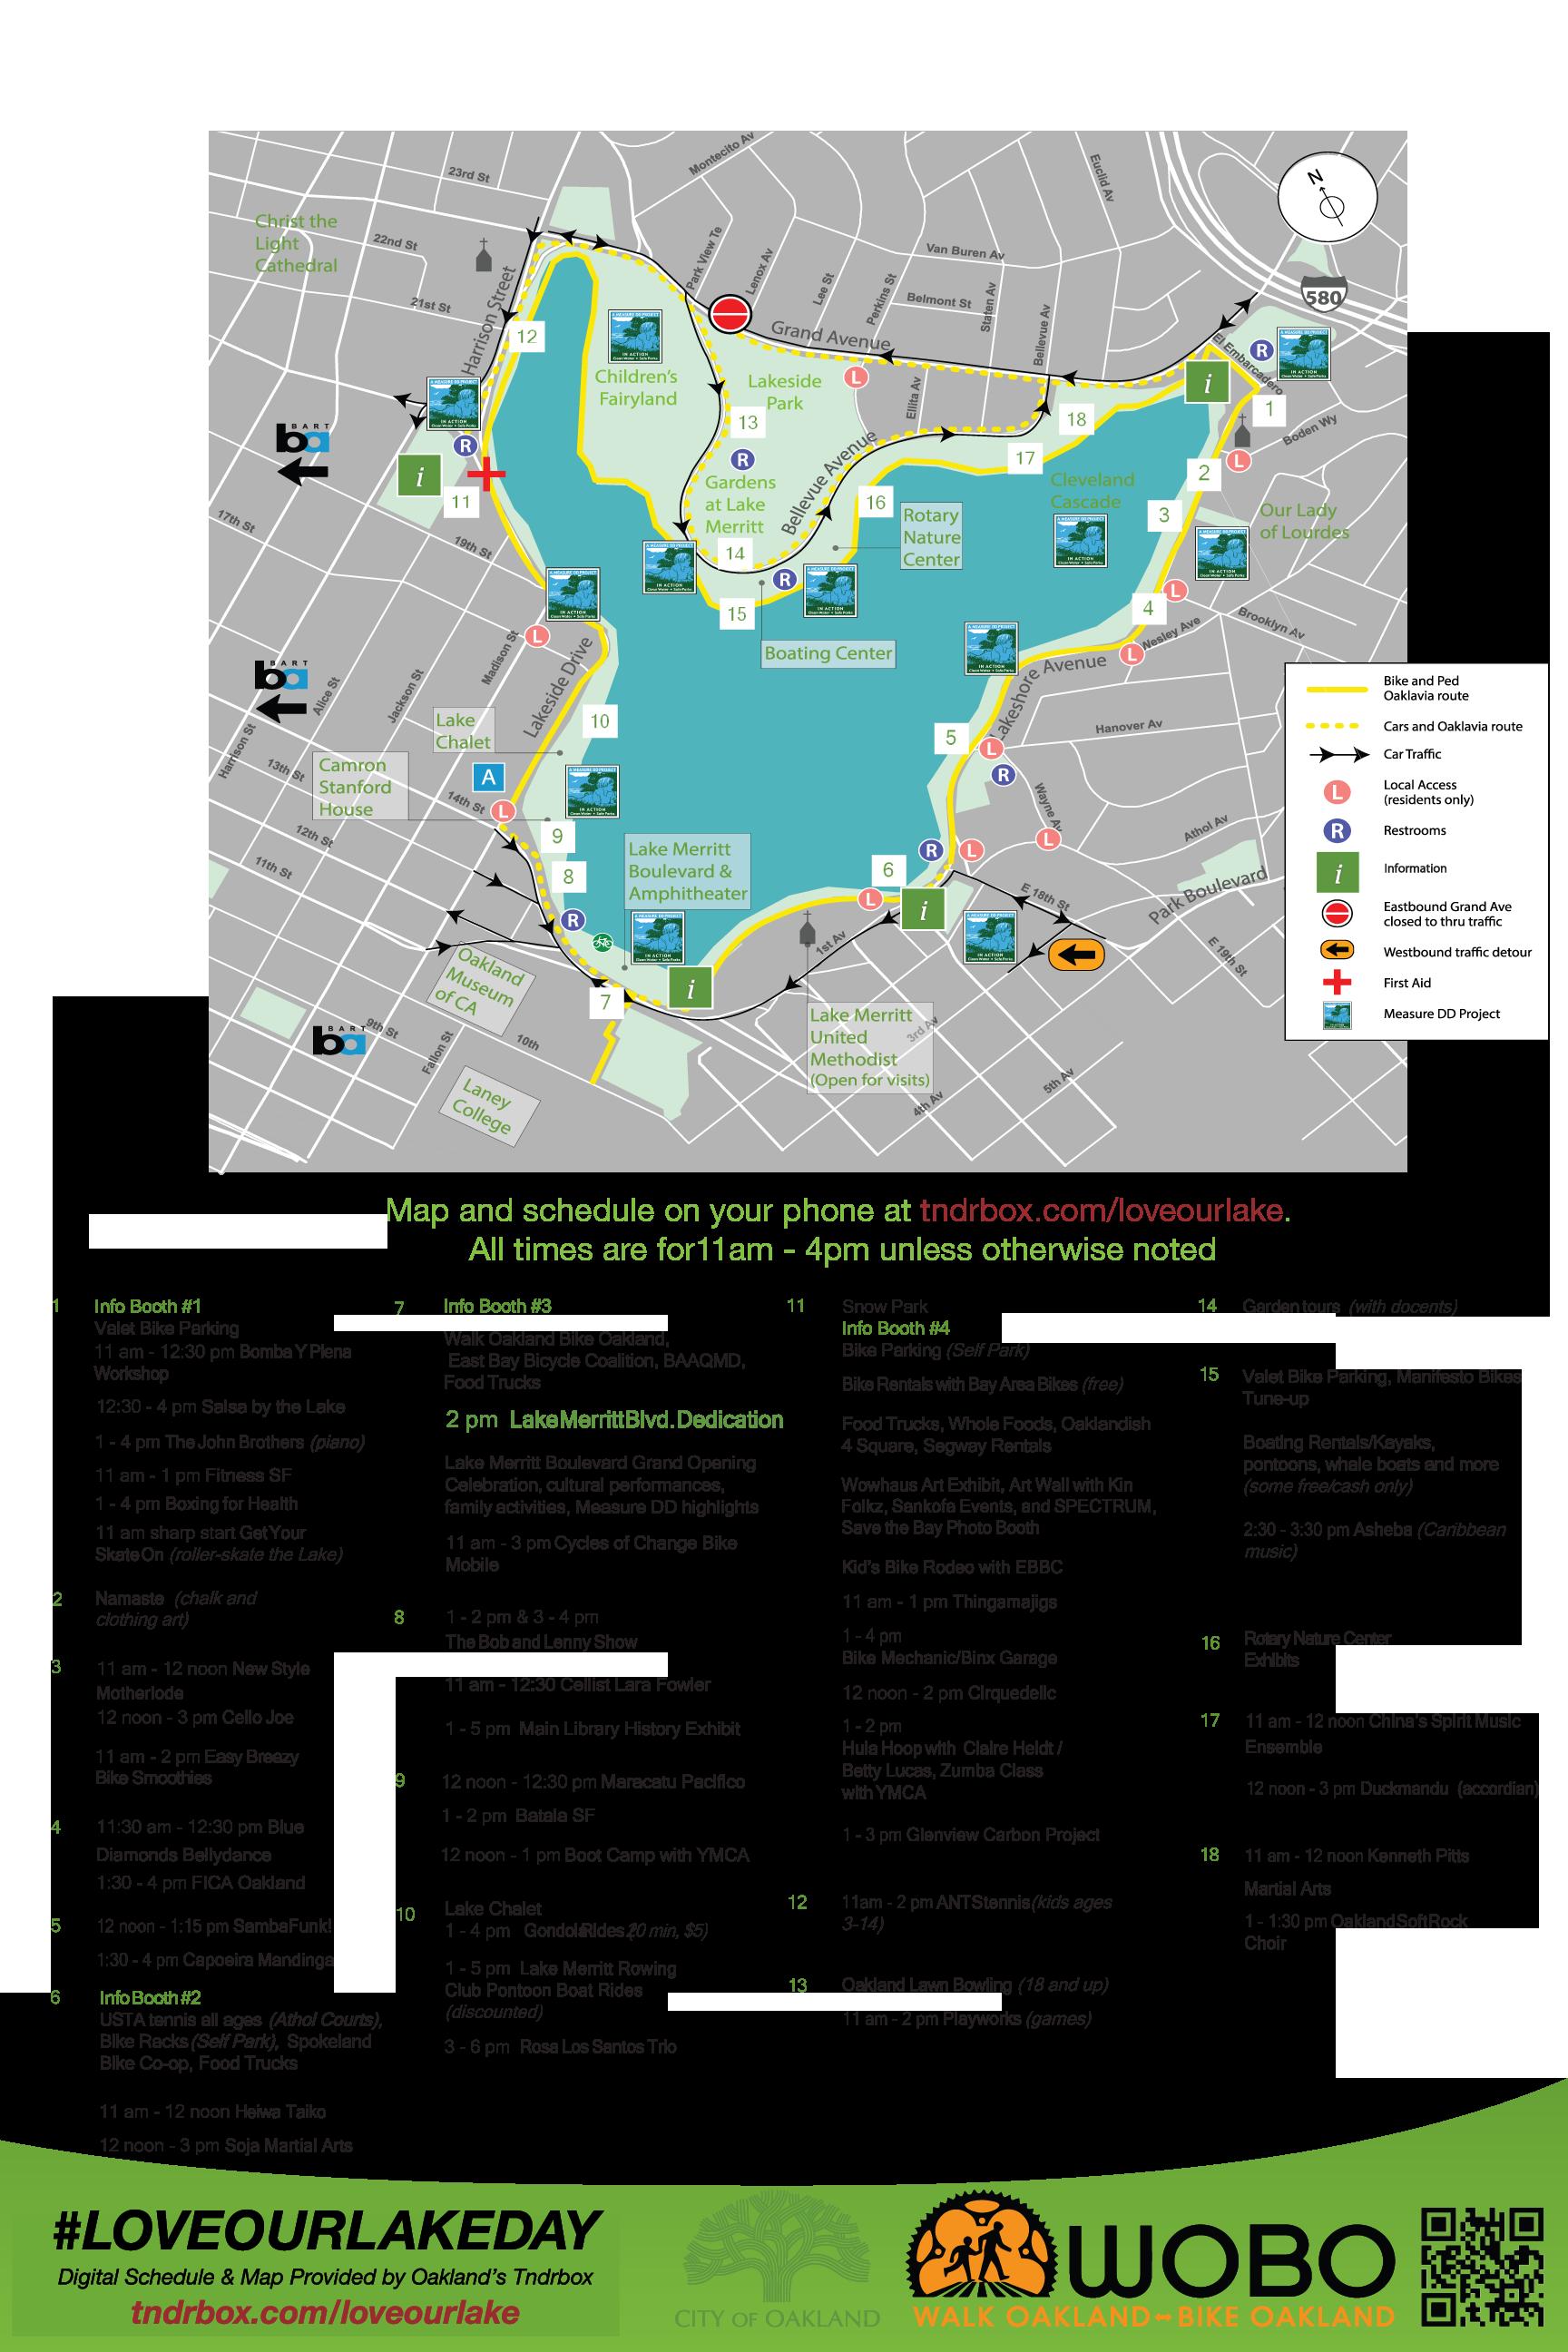 map_activitylistfinal6_3_4